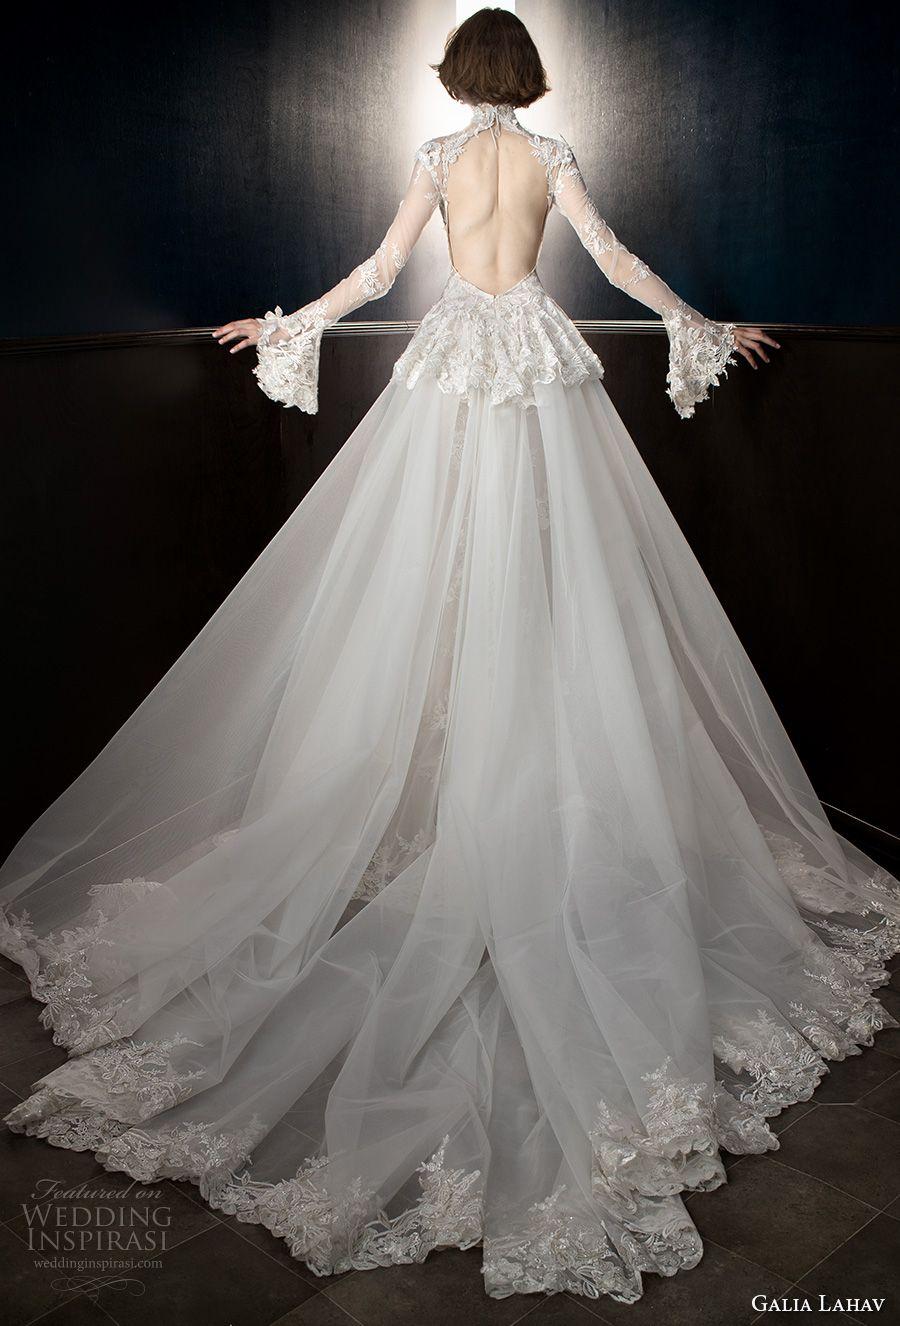 Galia lahav spring bridal long sleeves sheer high neck